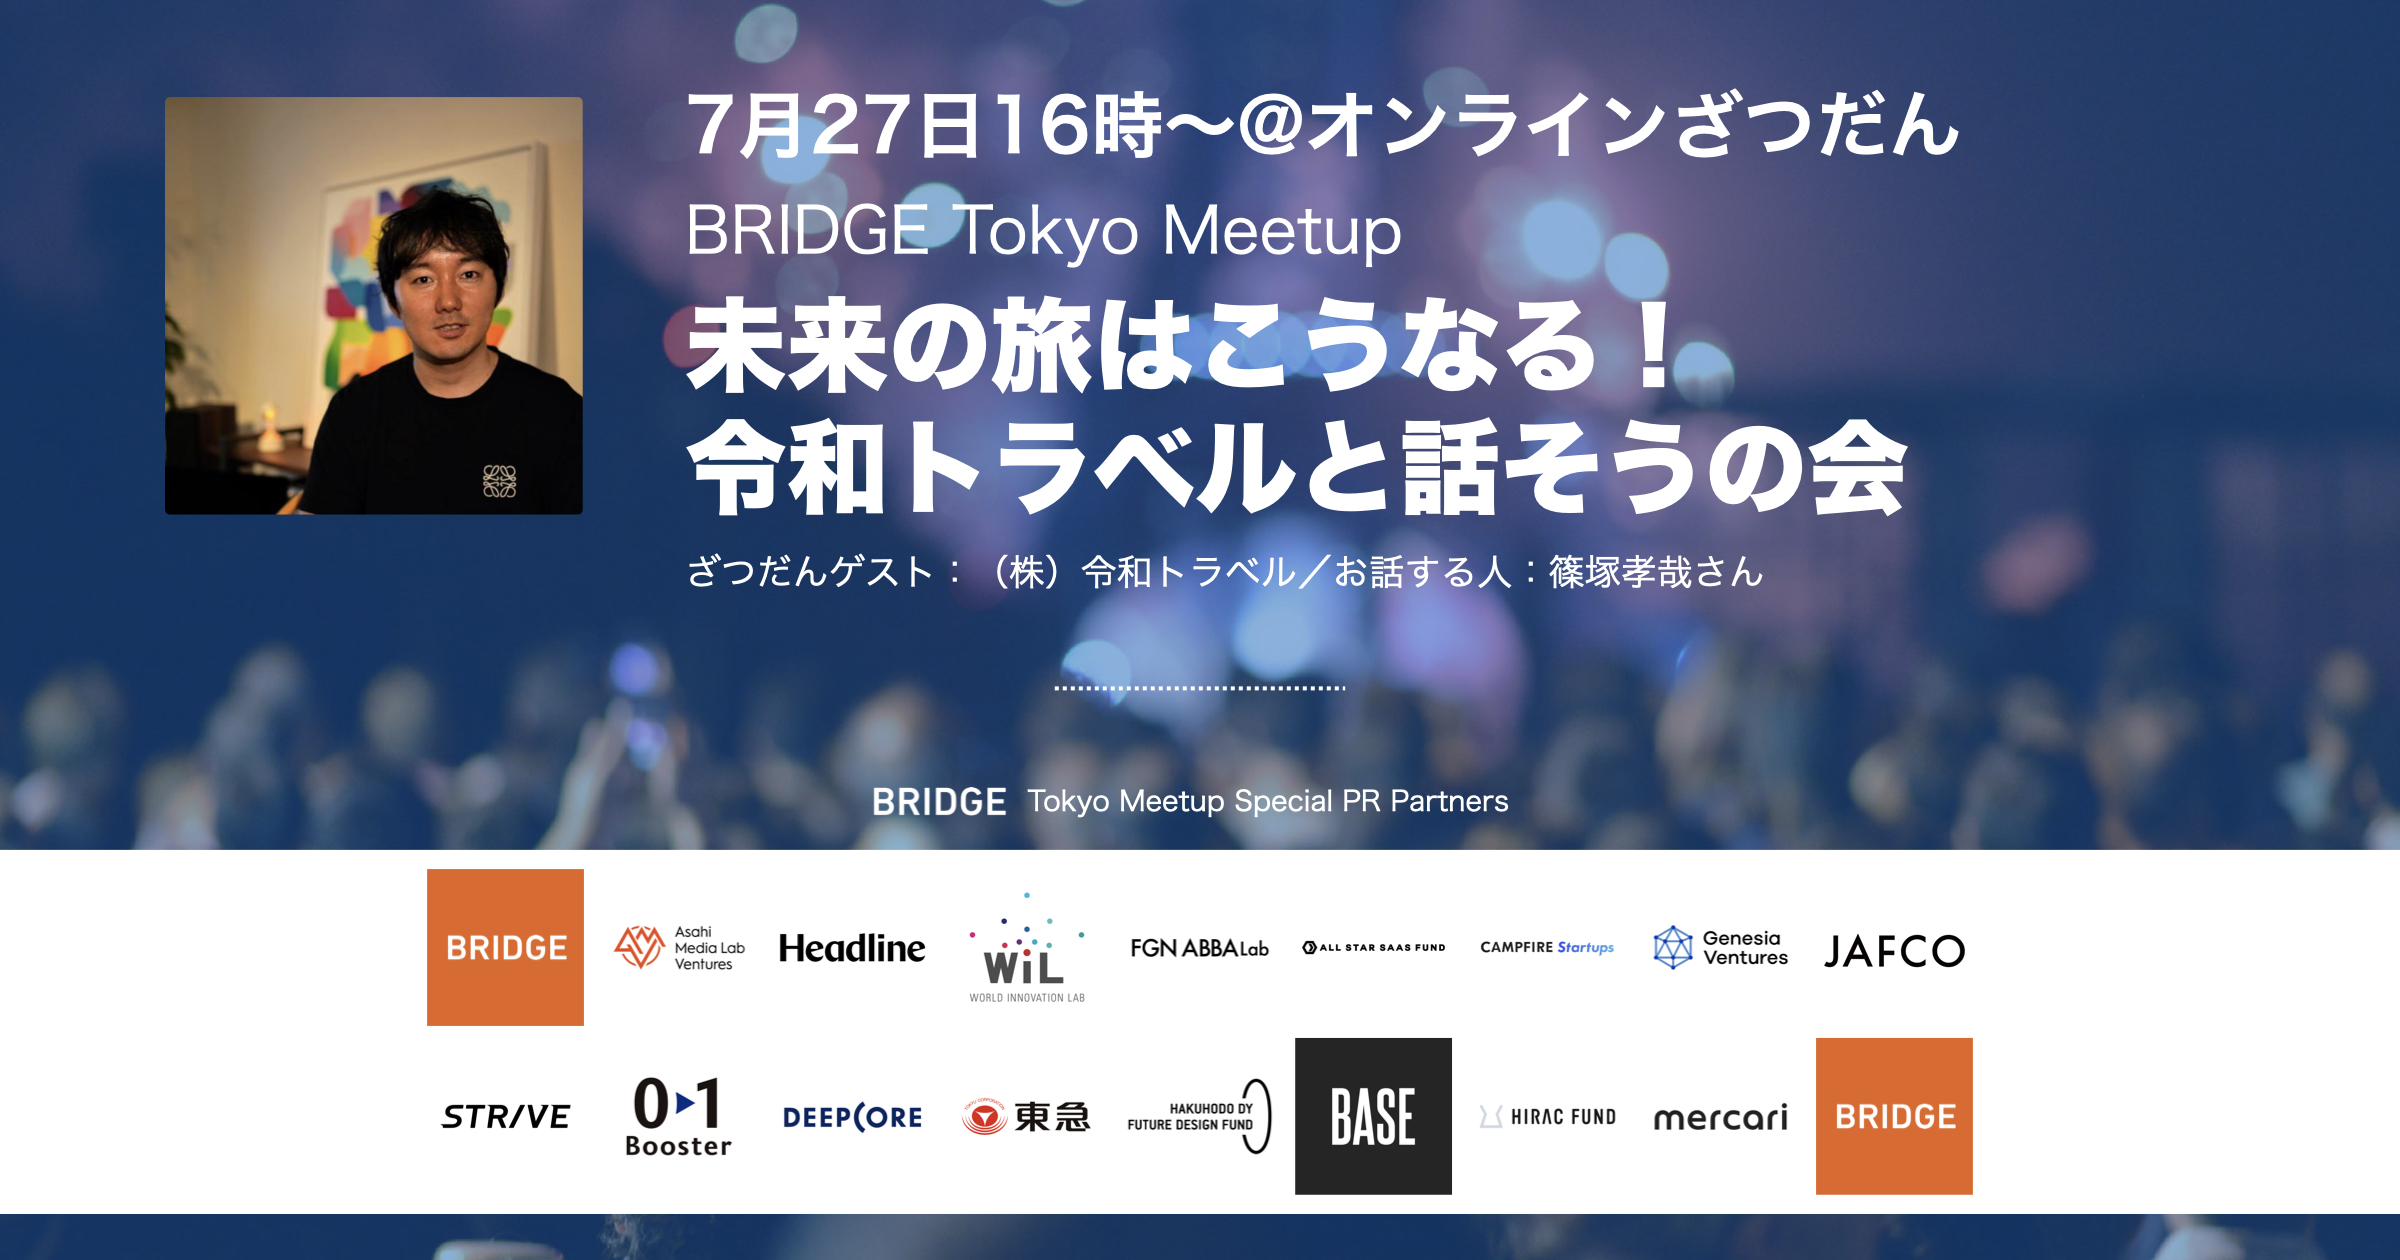 BRIDGE_Tokyo_Meetup